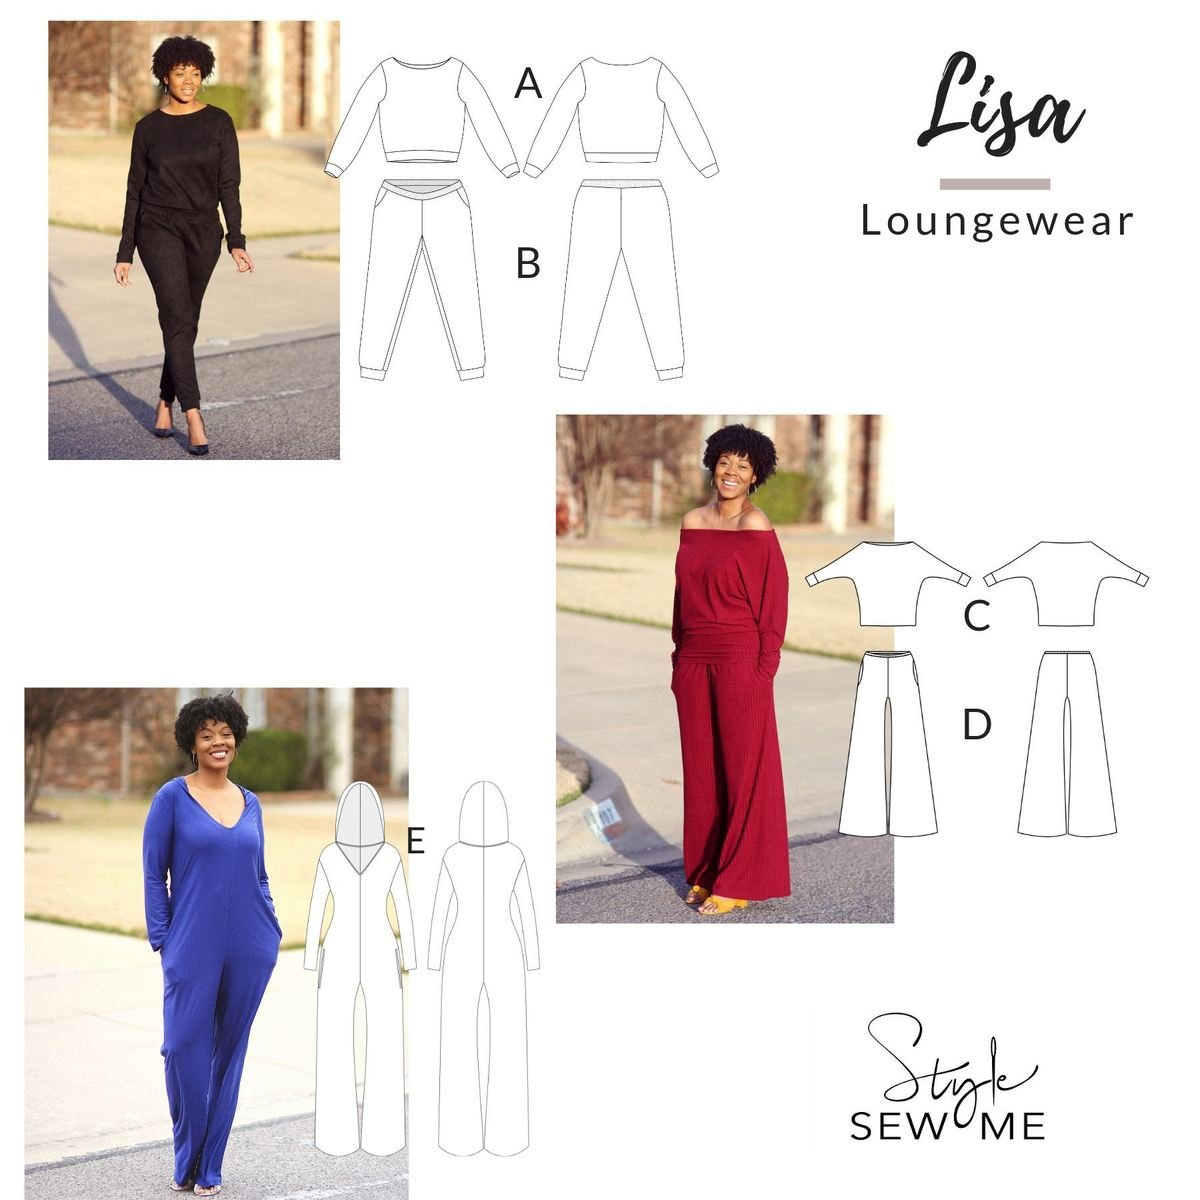 Lisa Loungewear Pattern Collection